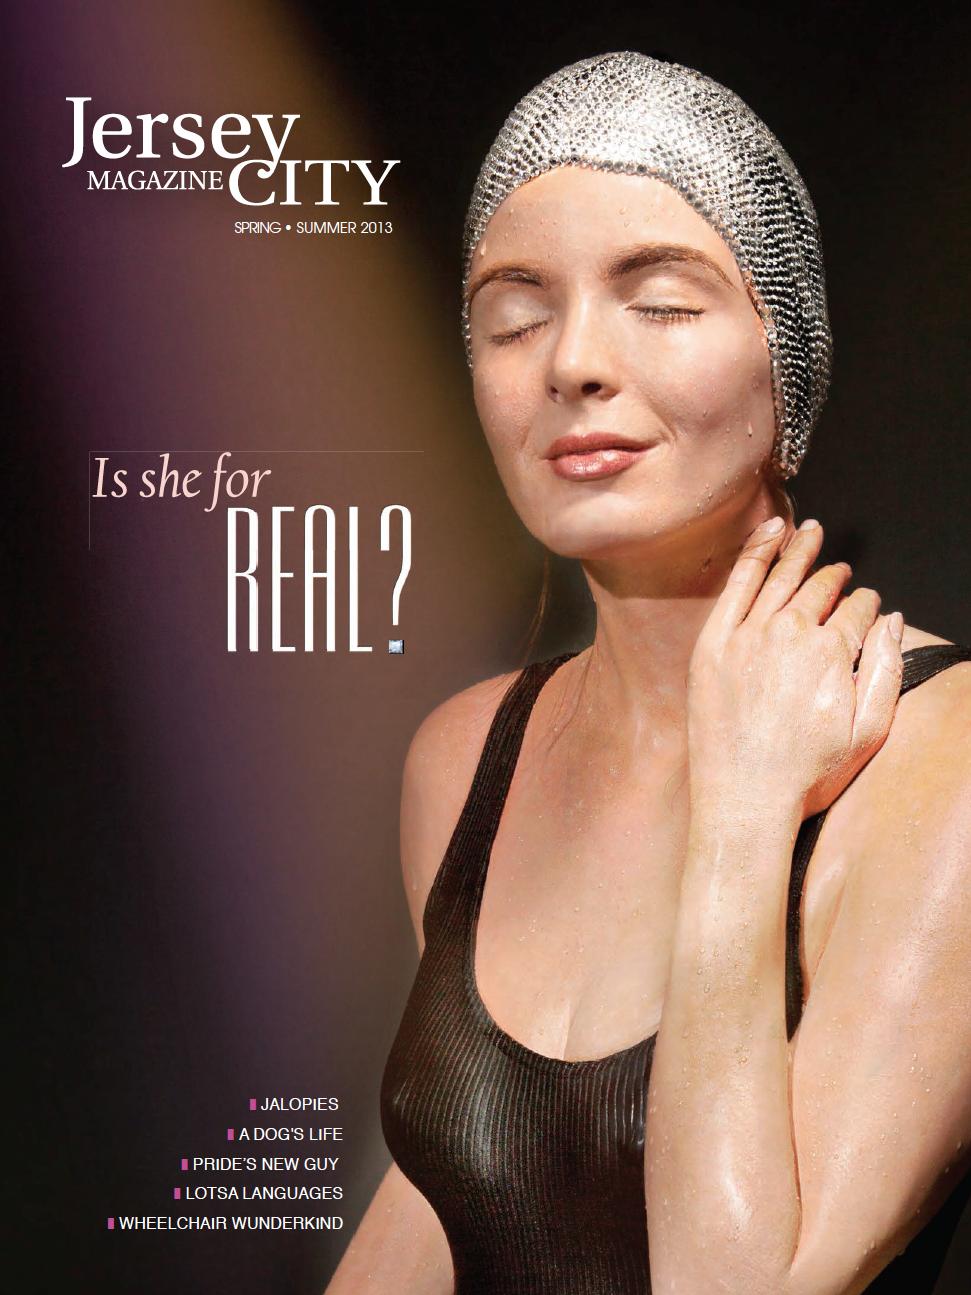 Jersey City Magazine